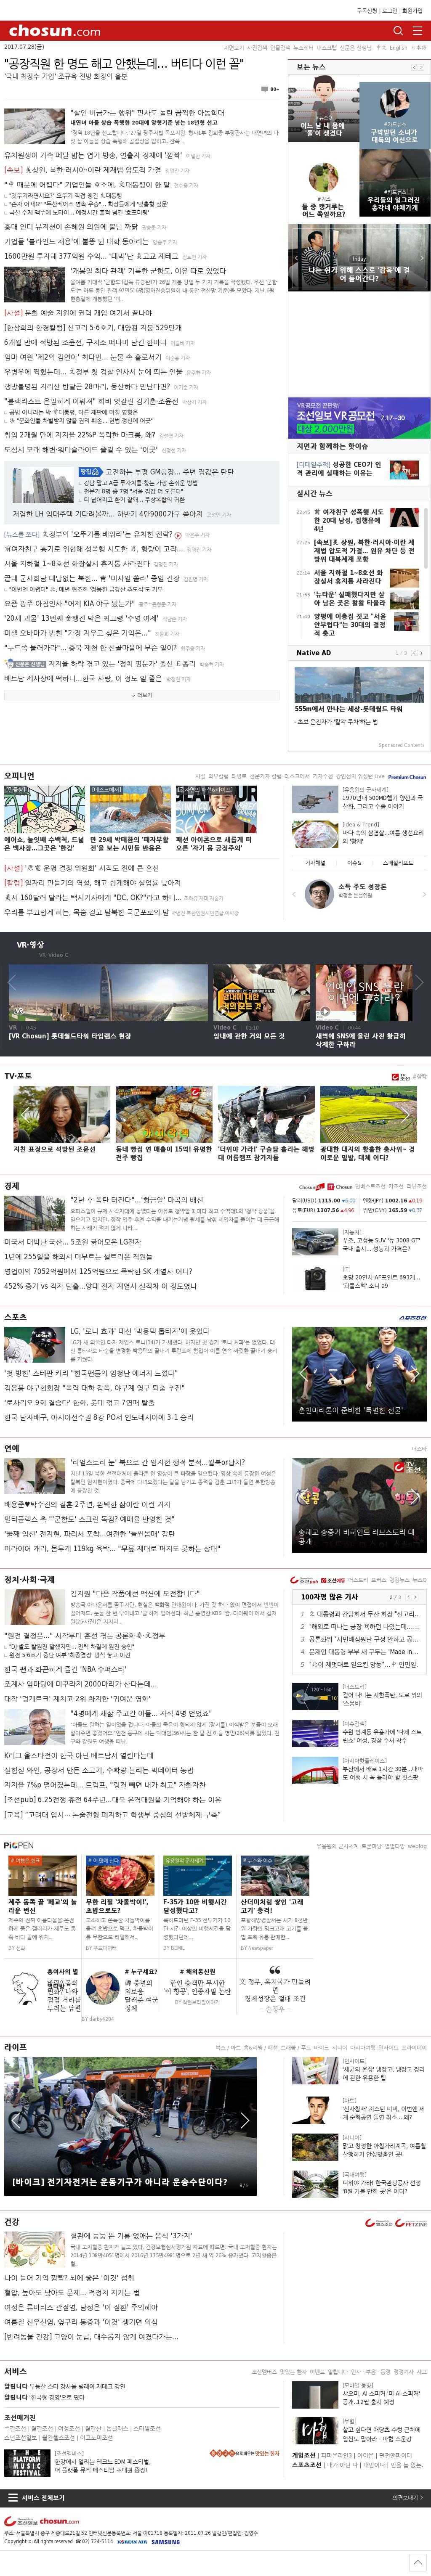 chosun.com at Thursday July 27, 2017, 11:02 p.m. UTC